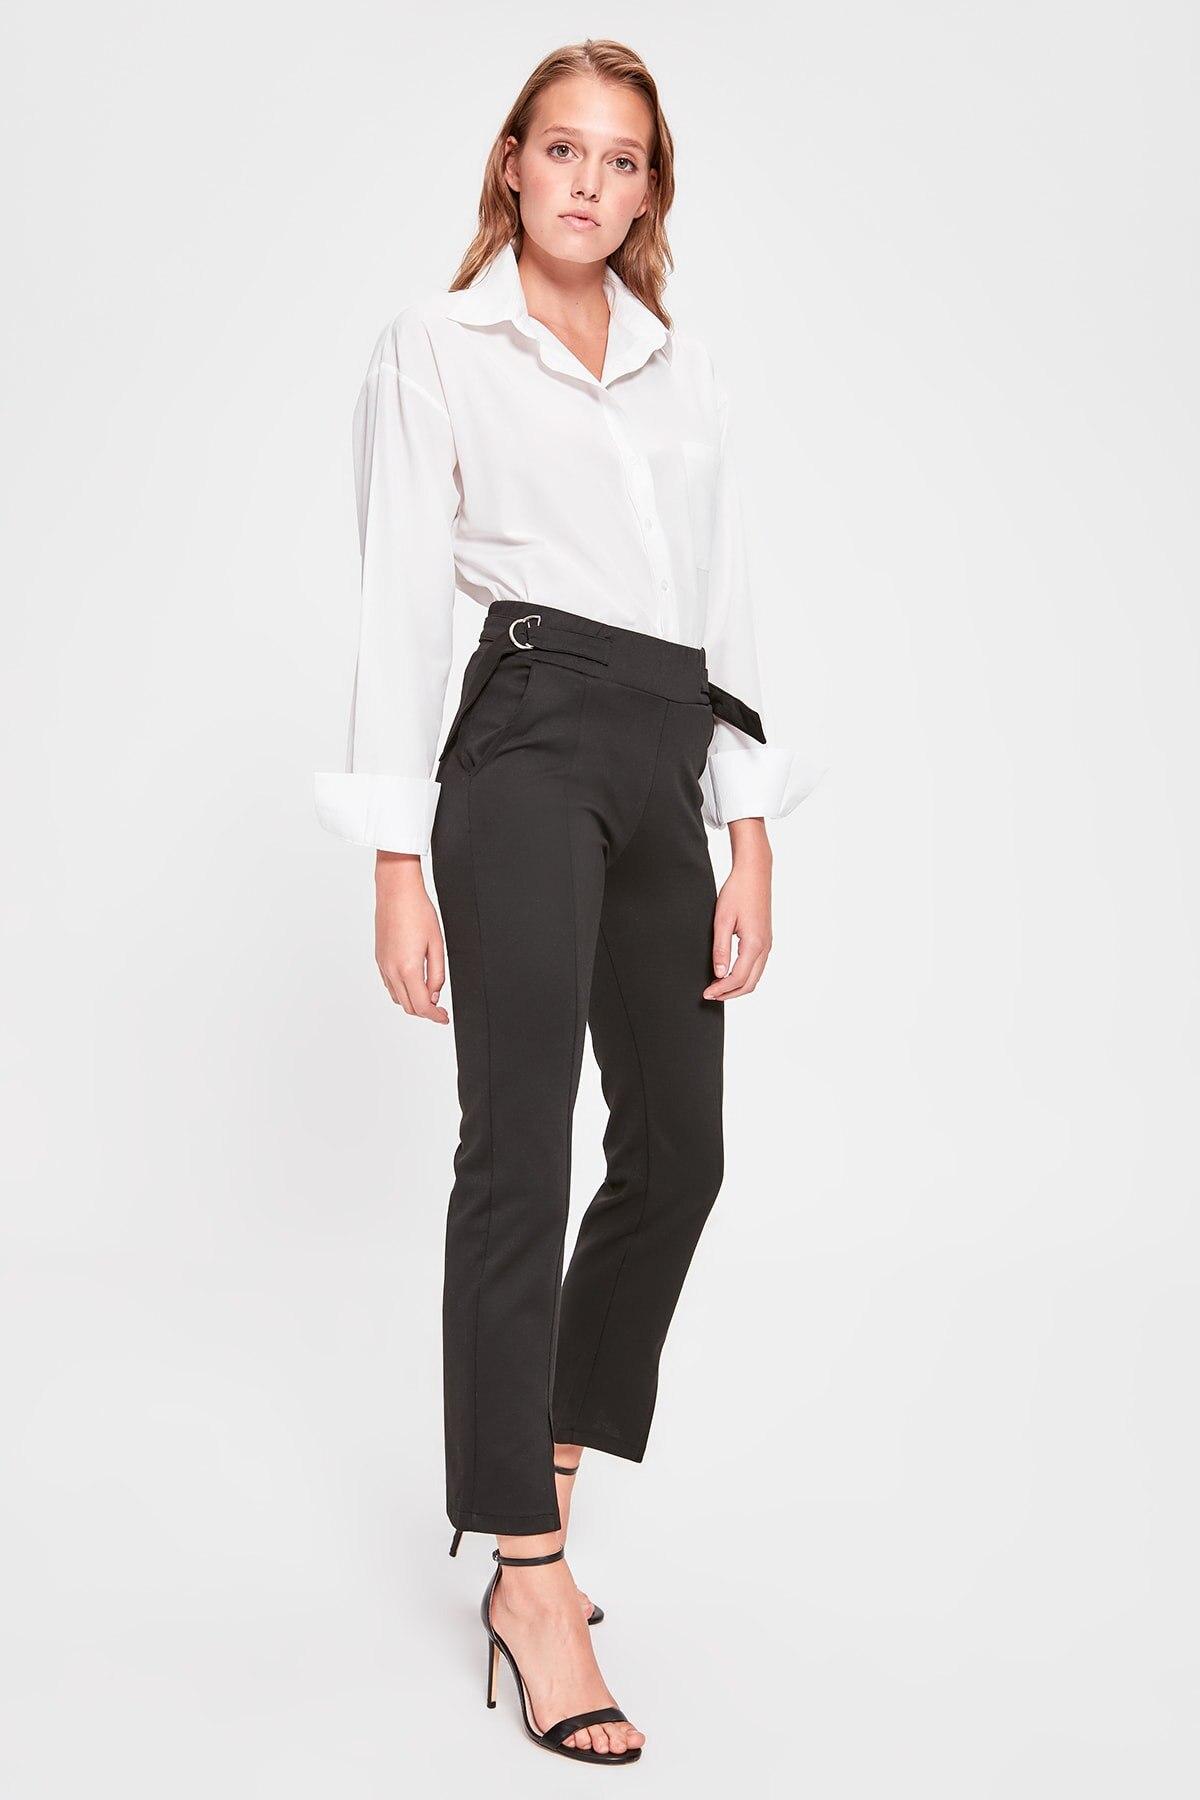 Trendyol Black Arched Knitting Pants TWOAW20PL0238